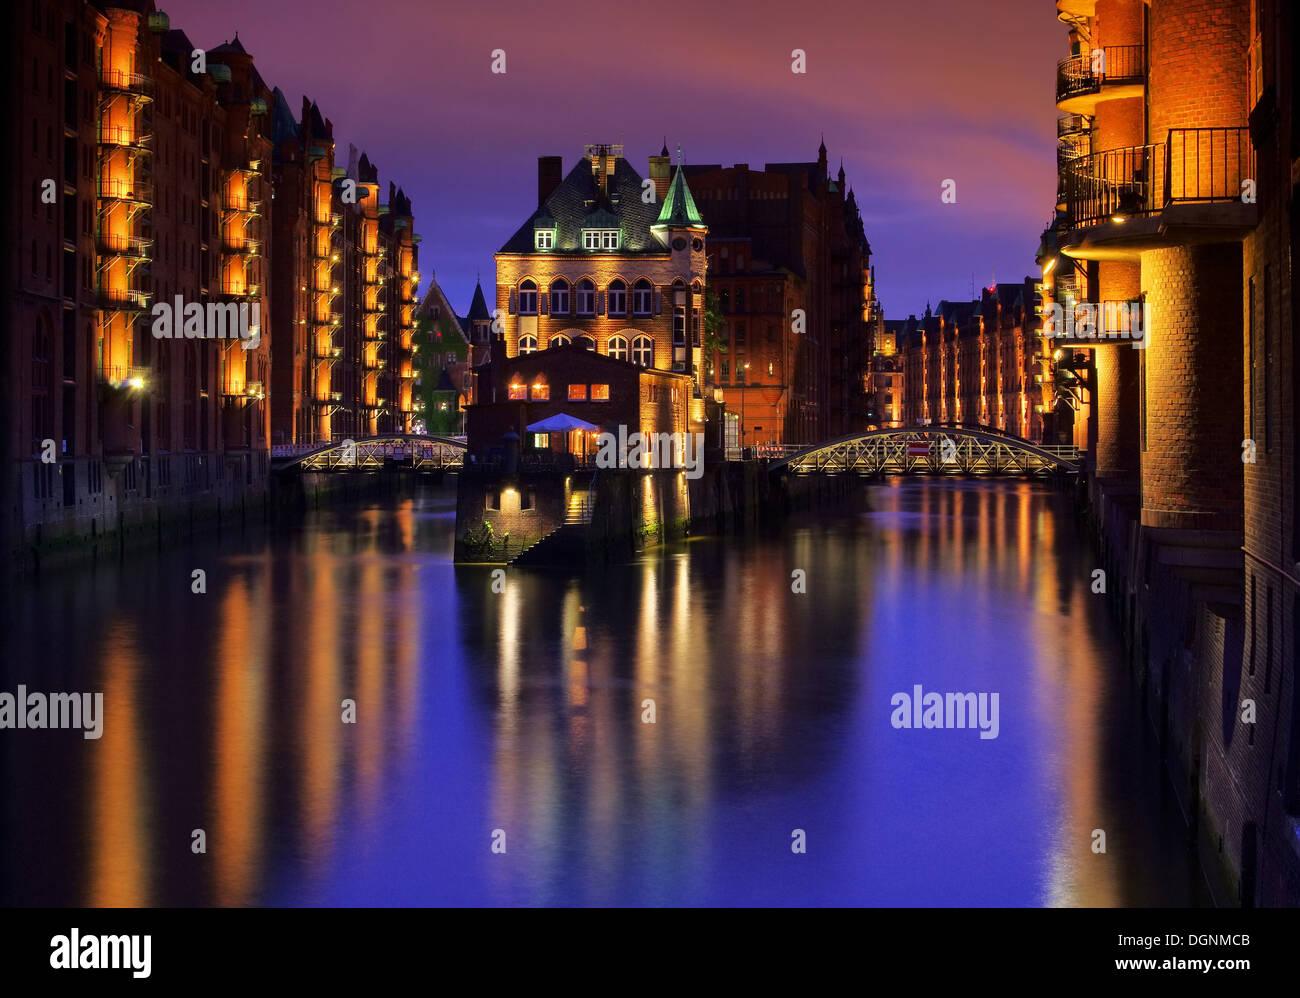 Hamburg Speicherstadt Wasserschloss Nacht - Hamburg city of warehouses palace at night 02 Stock Photo